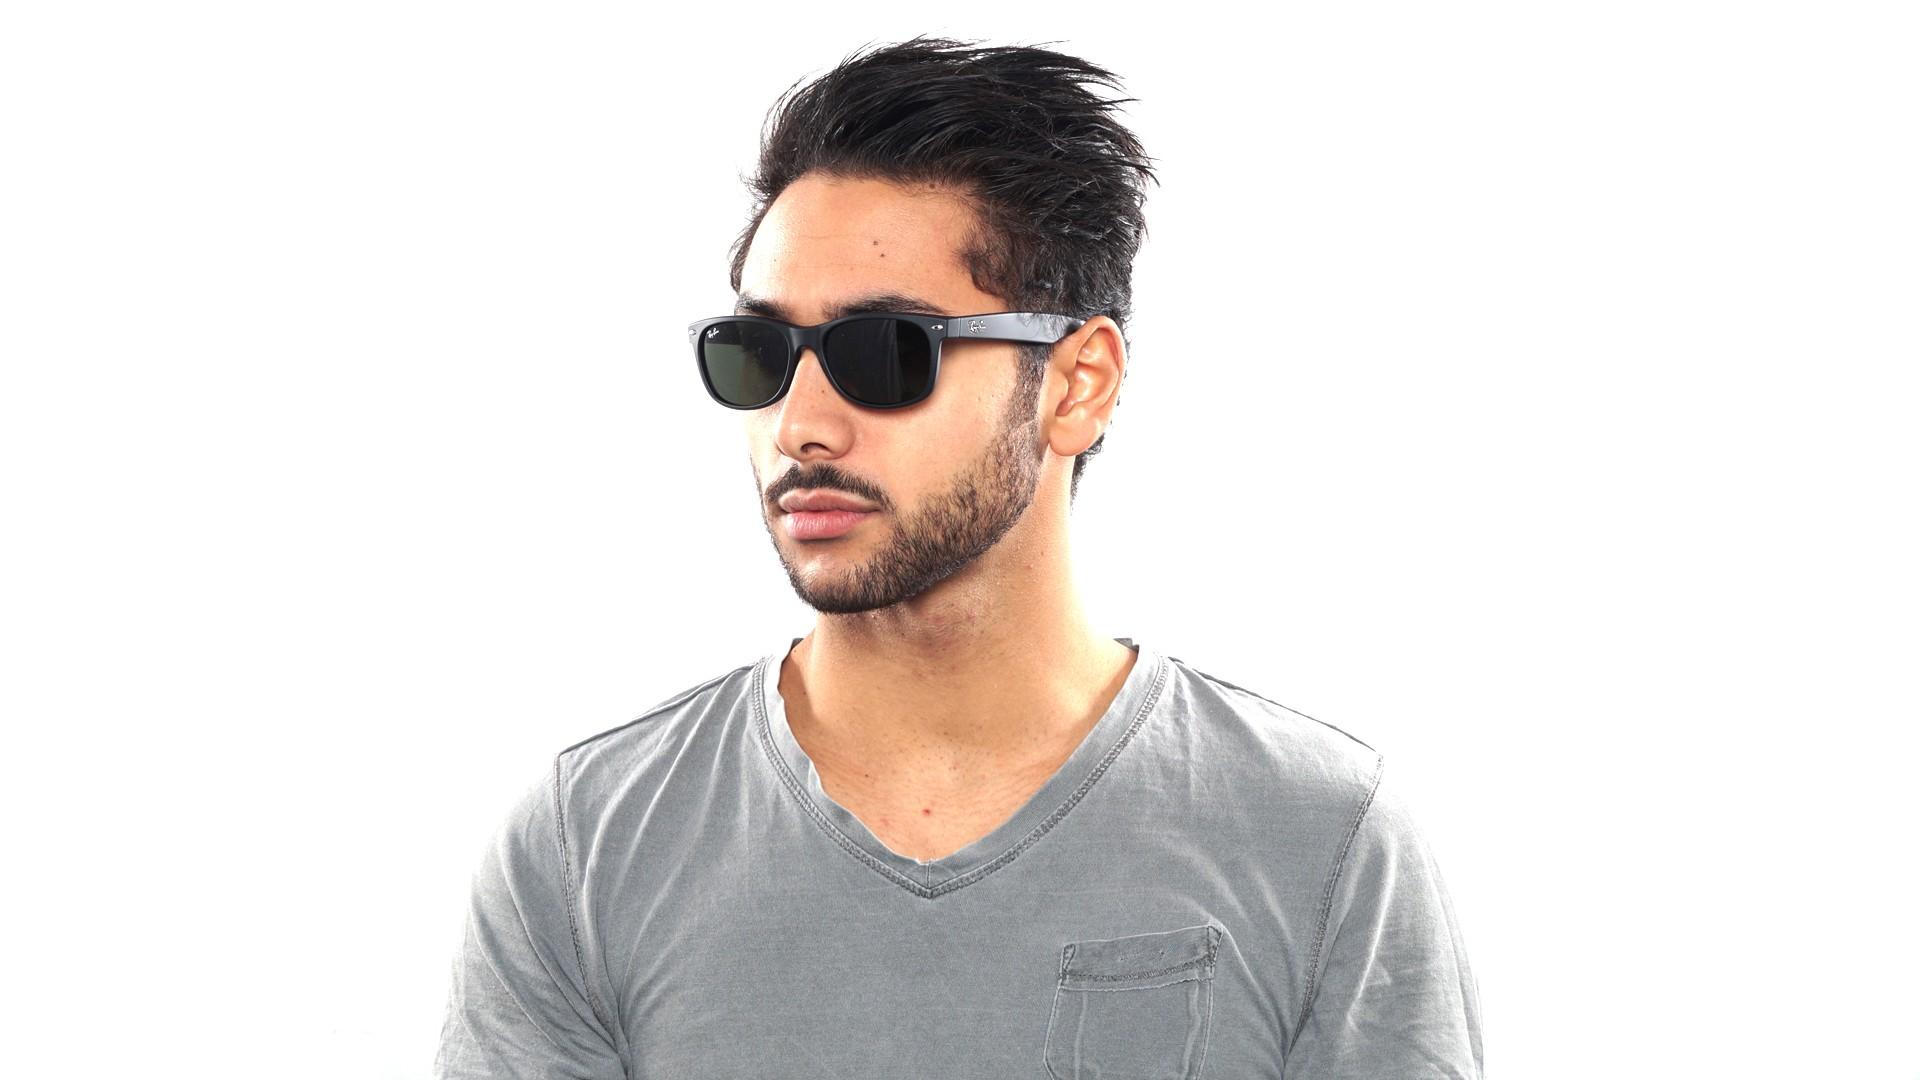 a1243b1b49a Sunglasses Ray-Ban New Wayfarer Asian Fit Black Matte G15 RB2132F 622 55-18  Large